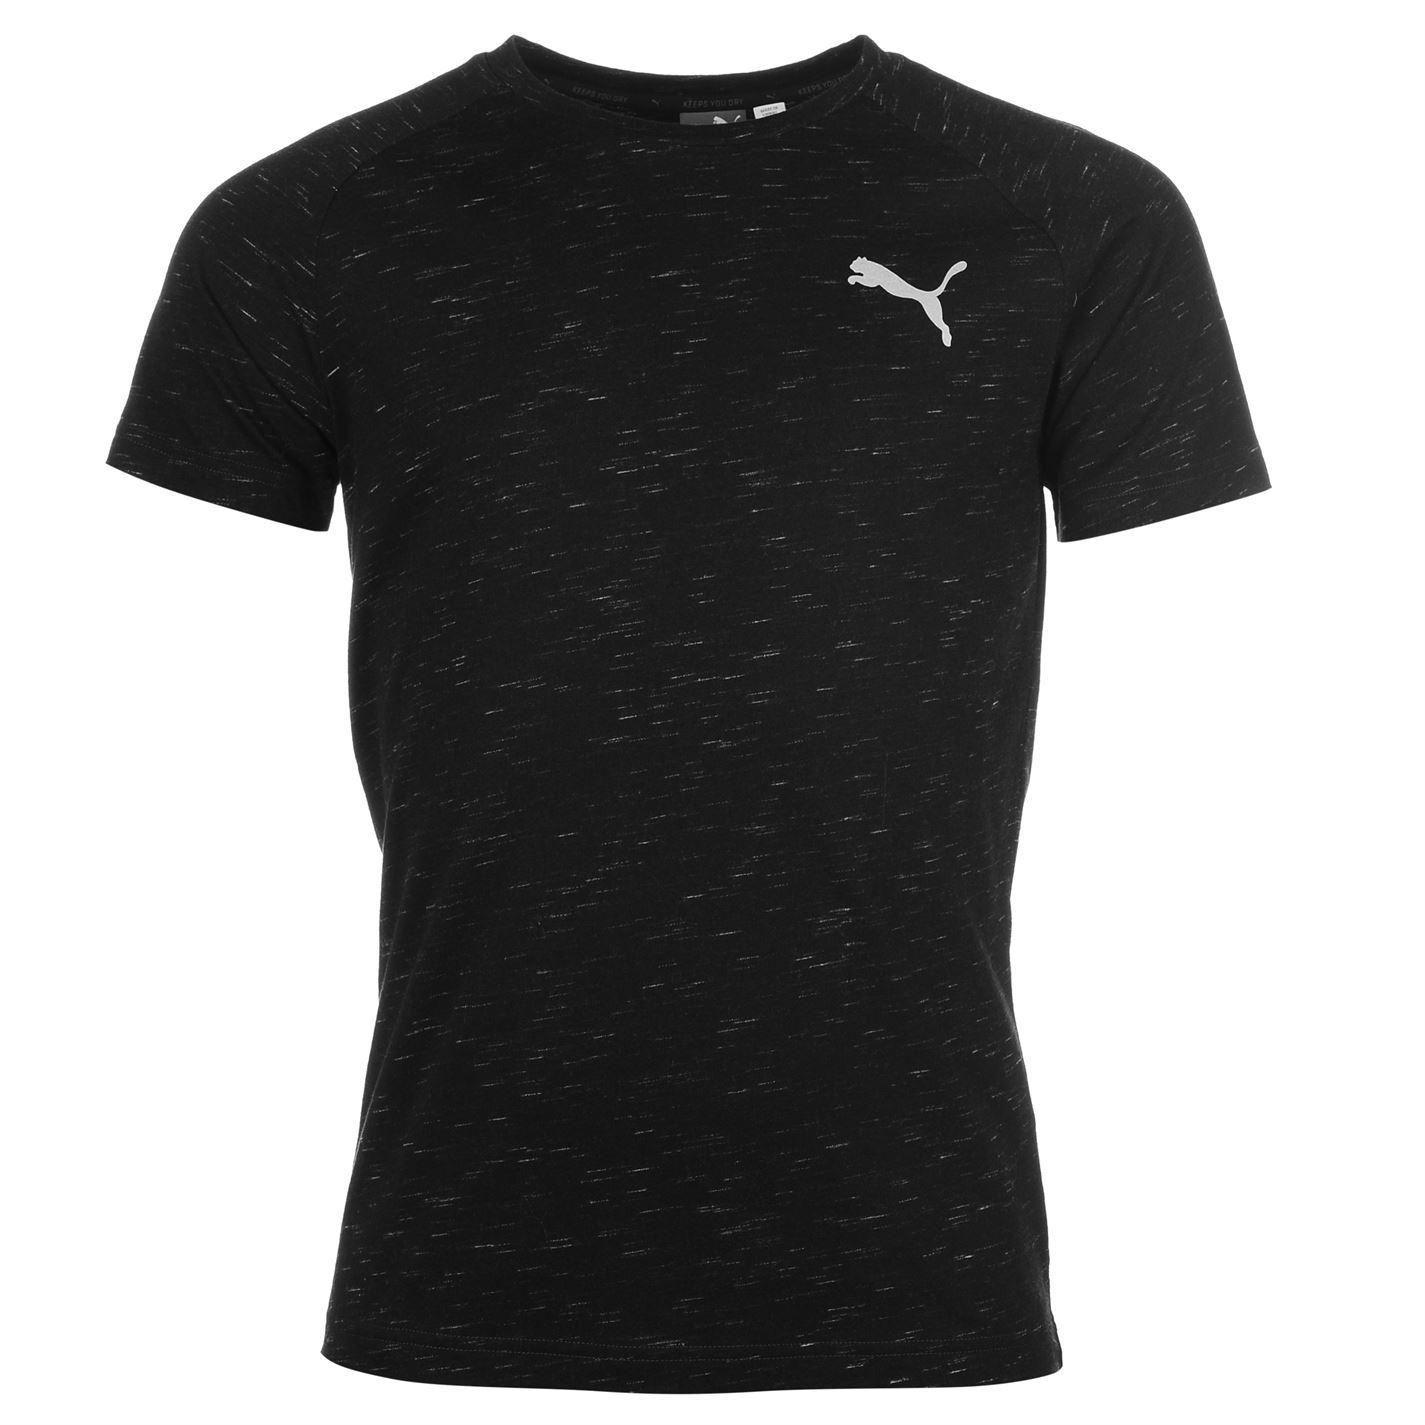 Puma Mens Evo Stripe T Shirt Tee Top Short Sleeve Crew